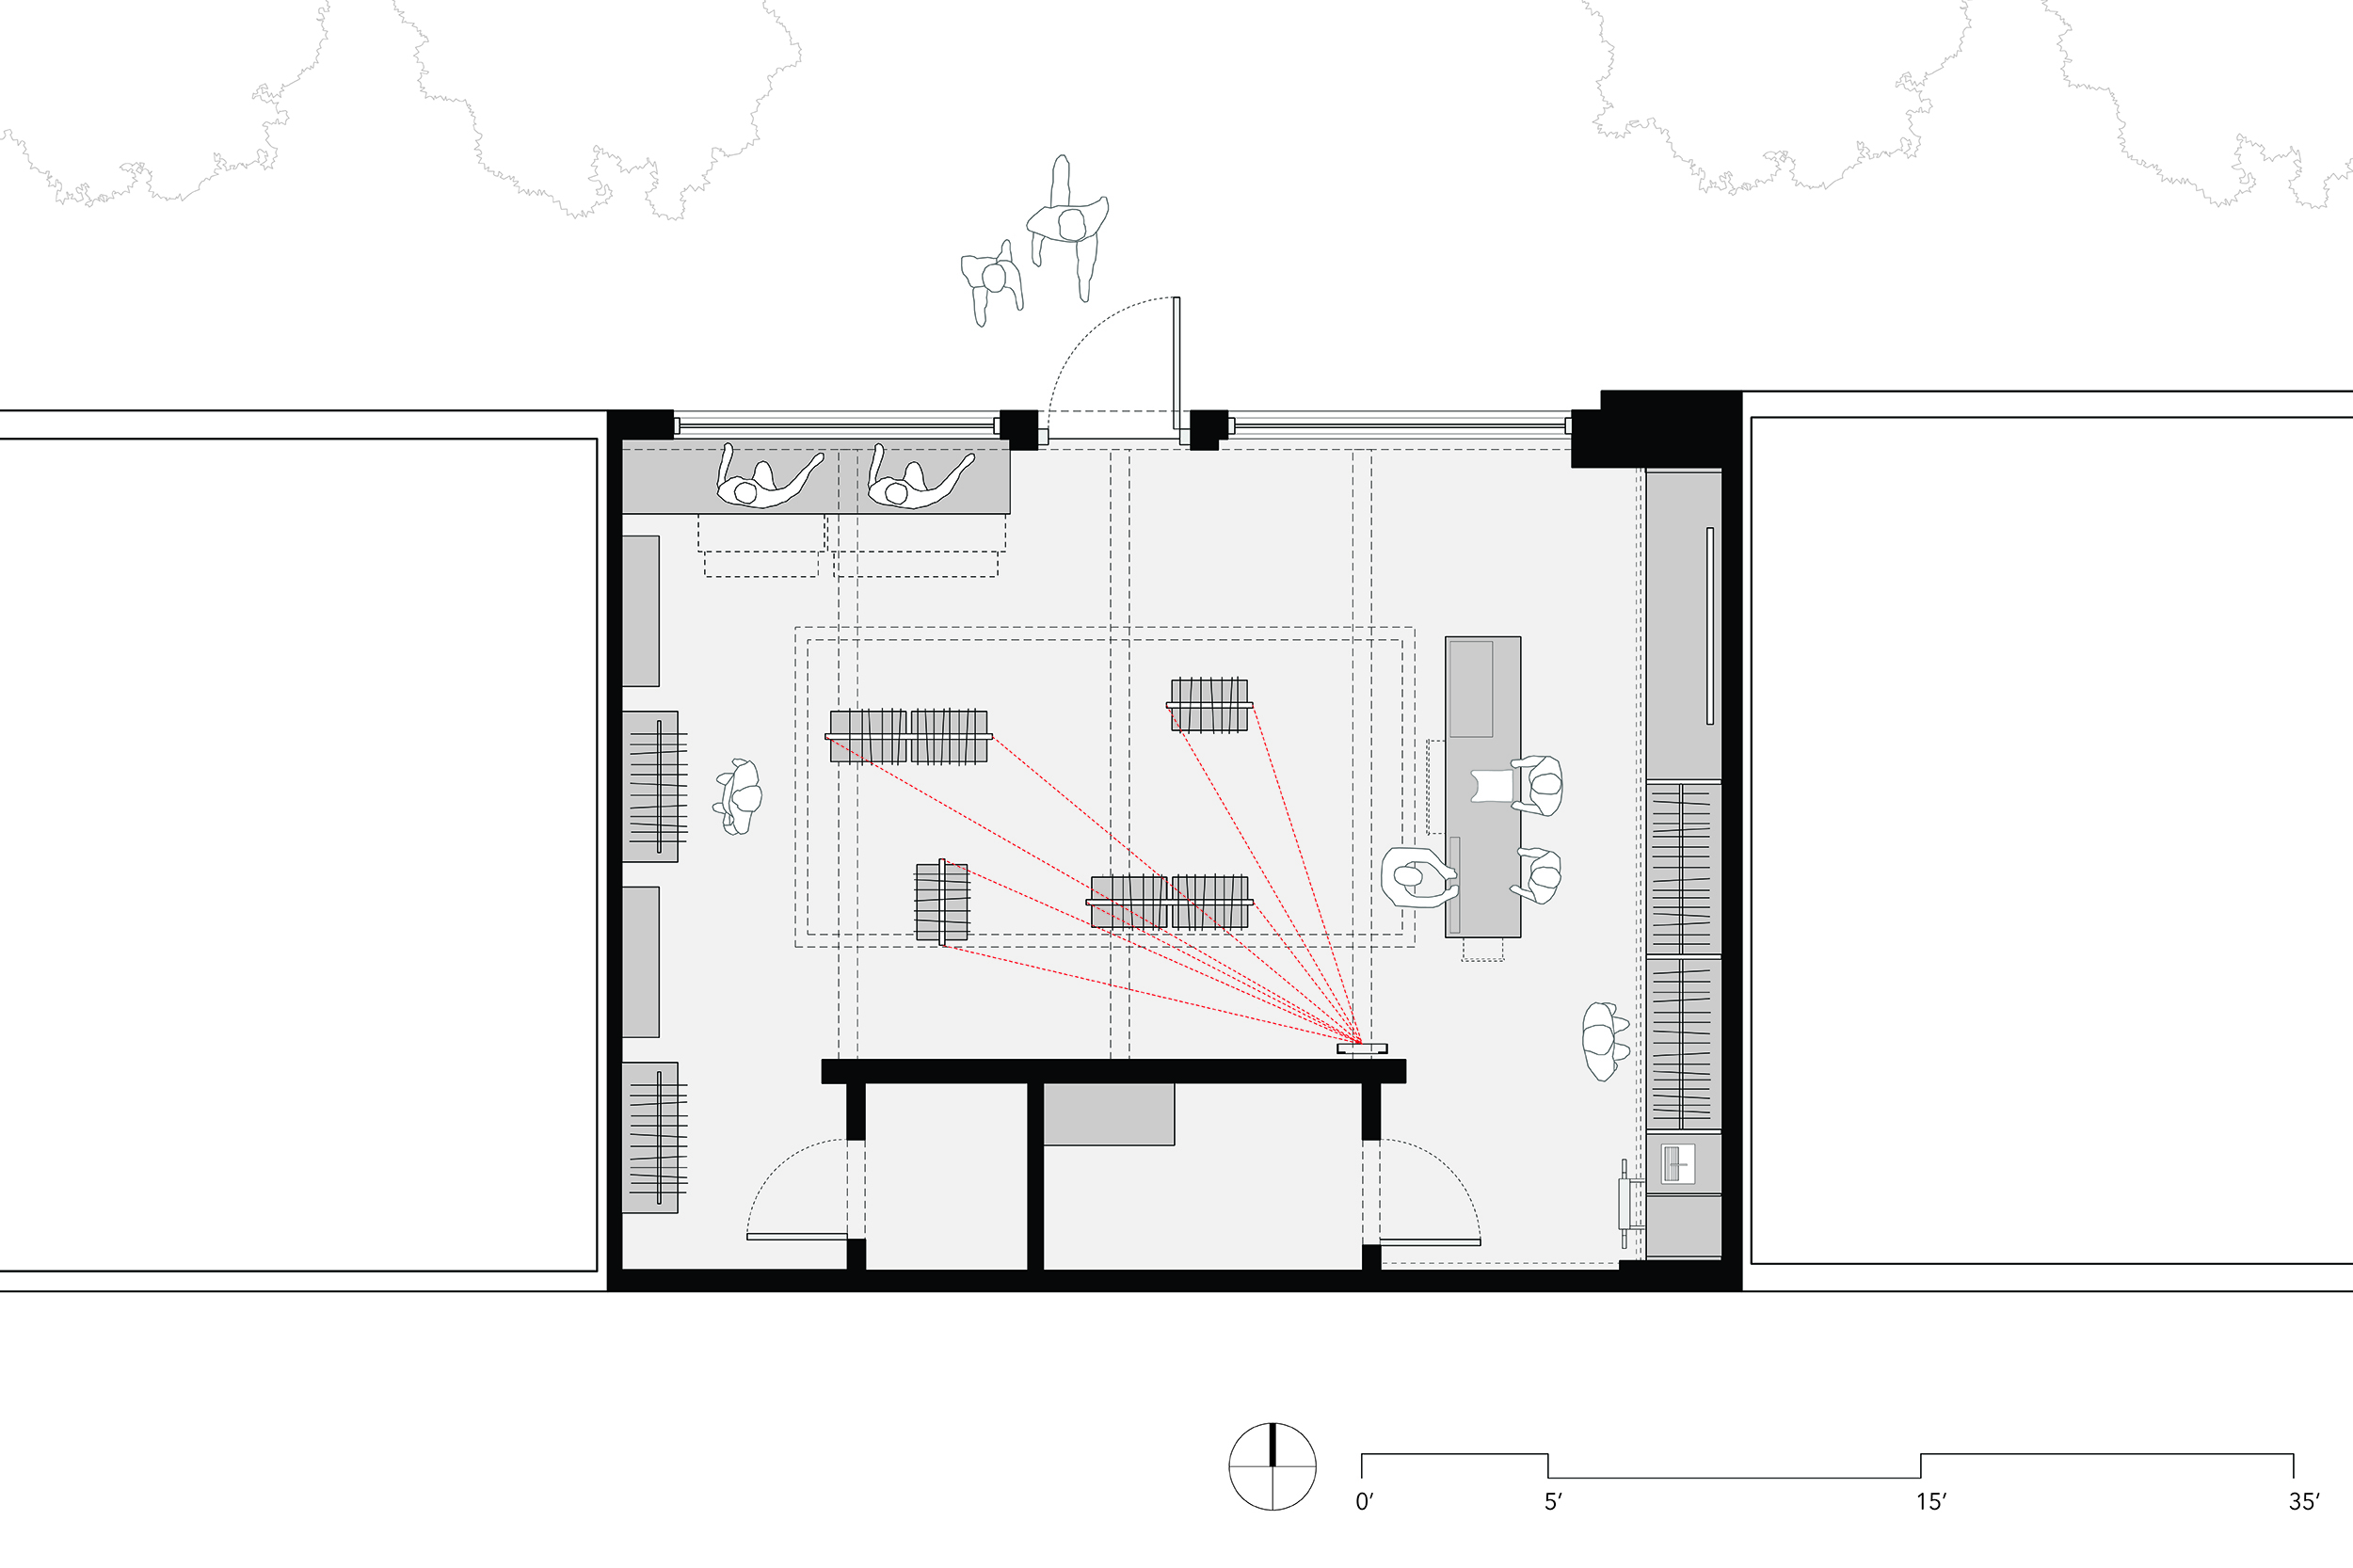 goCstudio_Oiselle Presentation Plan.jpg